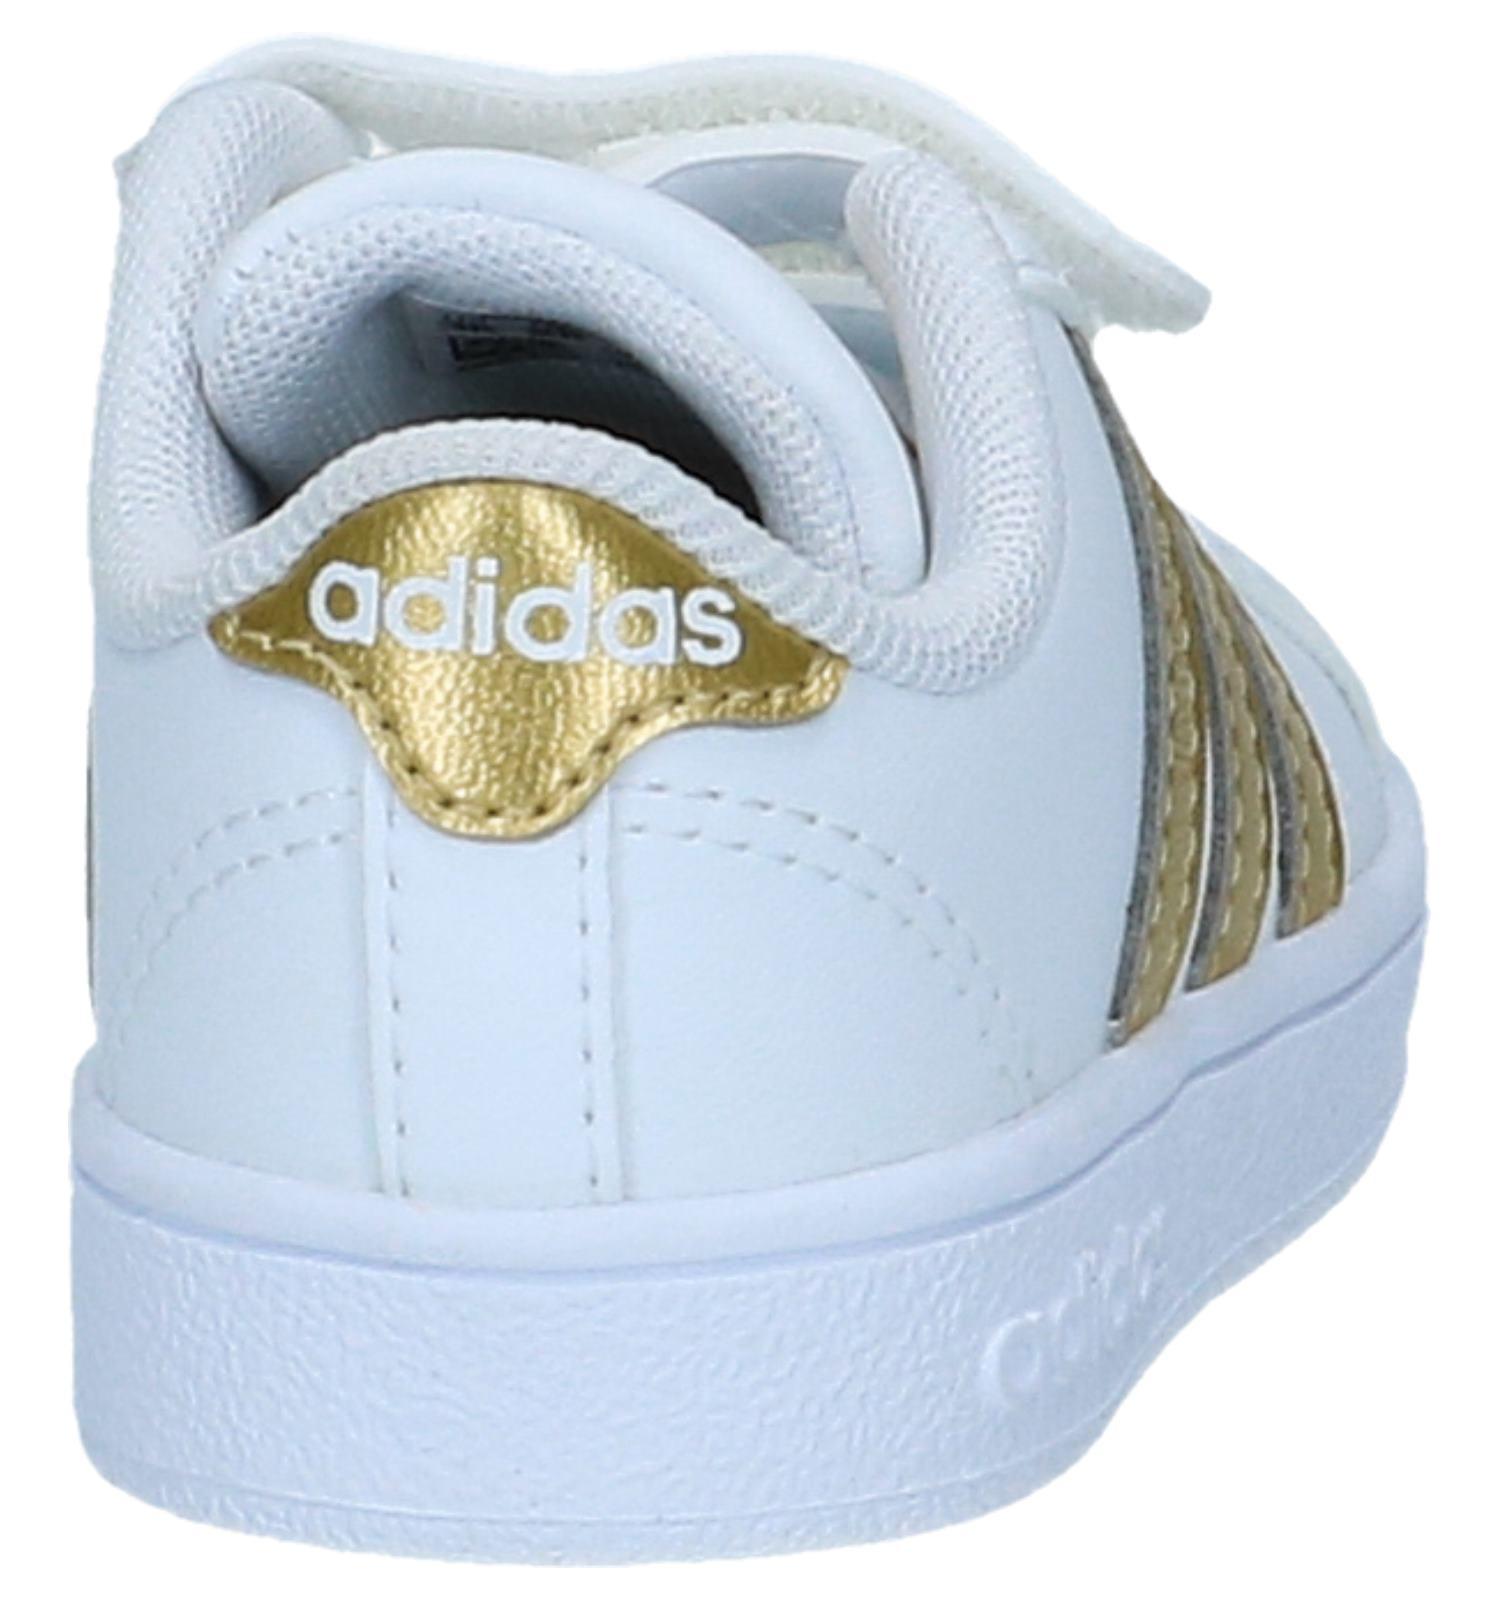 67f32e90b15 Witte met Gouden Lage Sneakers Adidas Baseline CMF | TORFS.BE | Gratis  verzend en retour